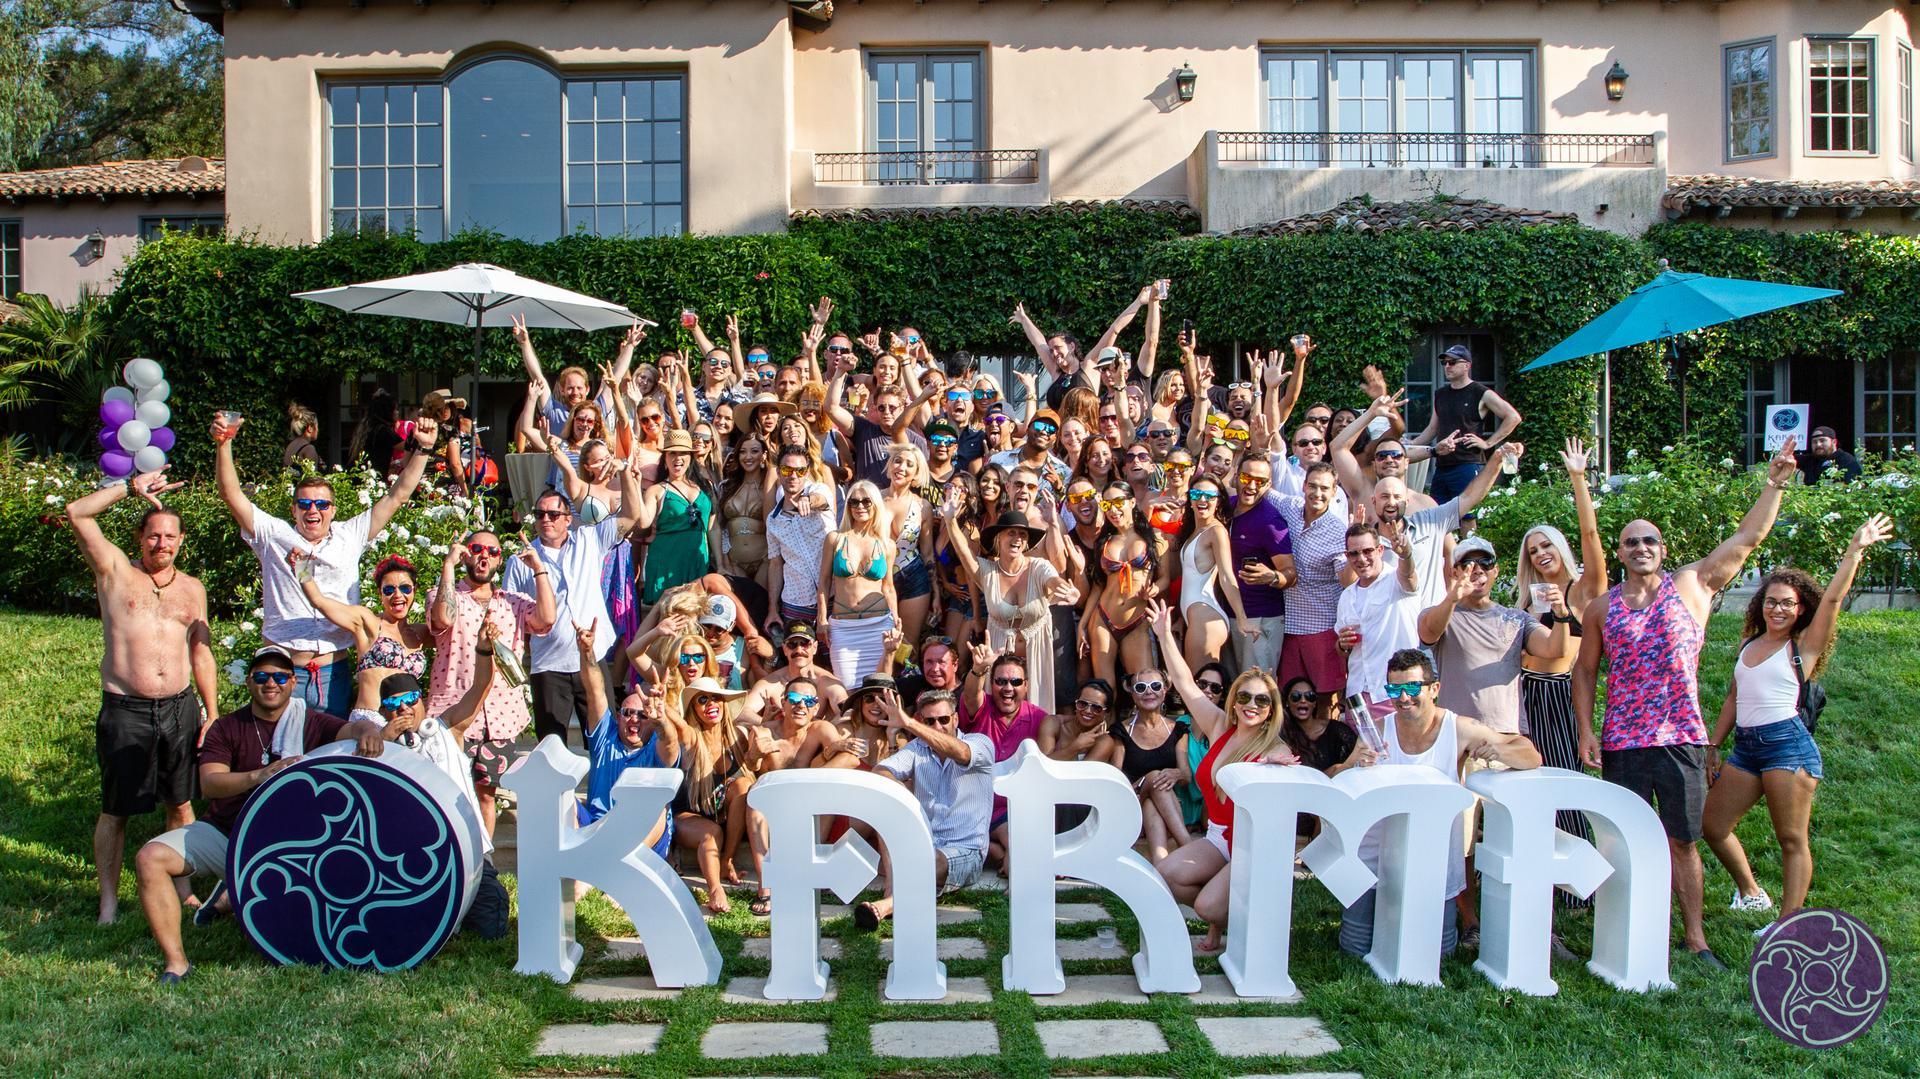 Karma International Pool Party by San Diego Creative Events 1.jpg